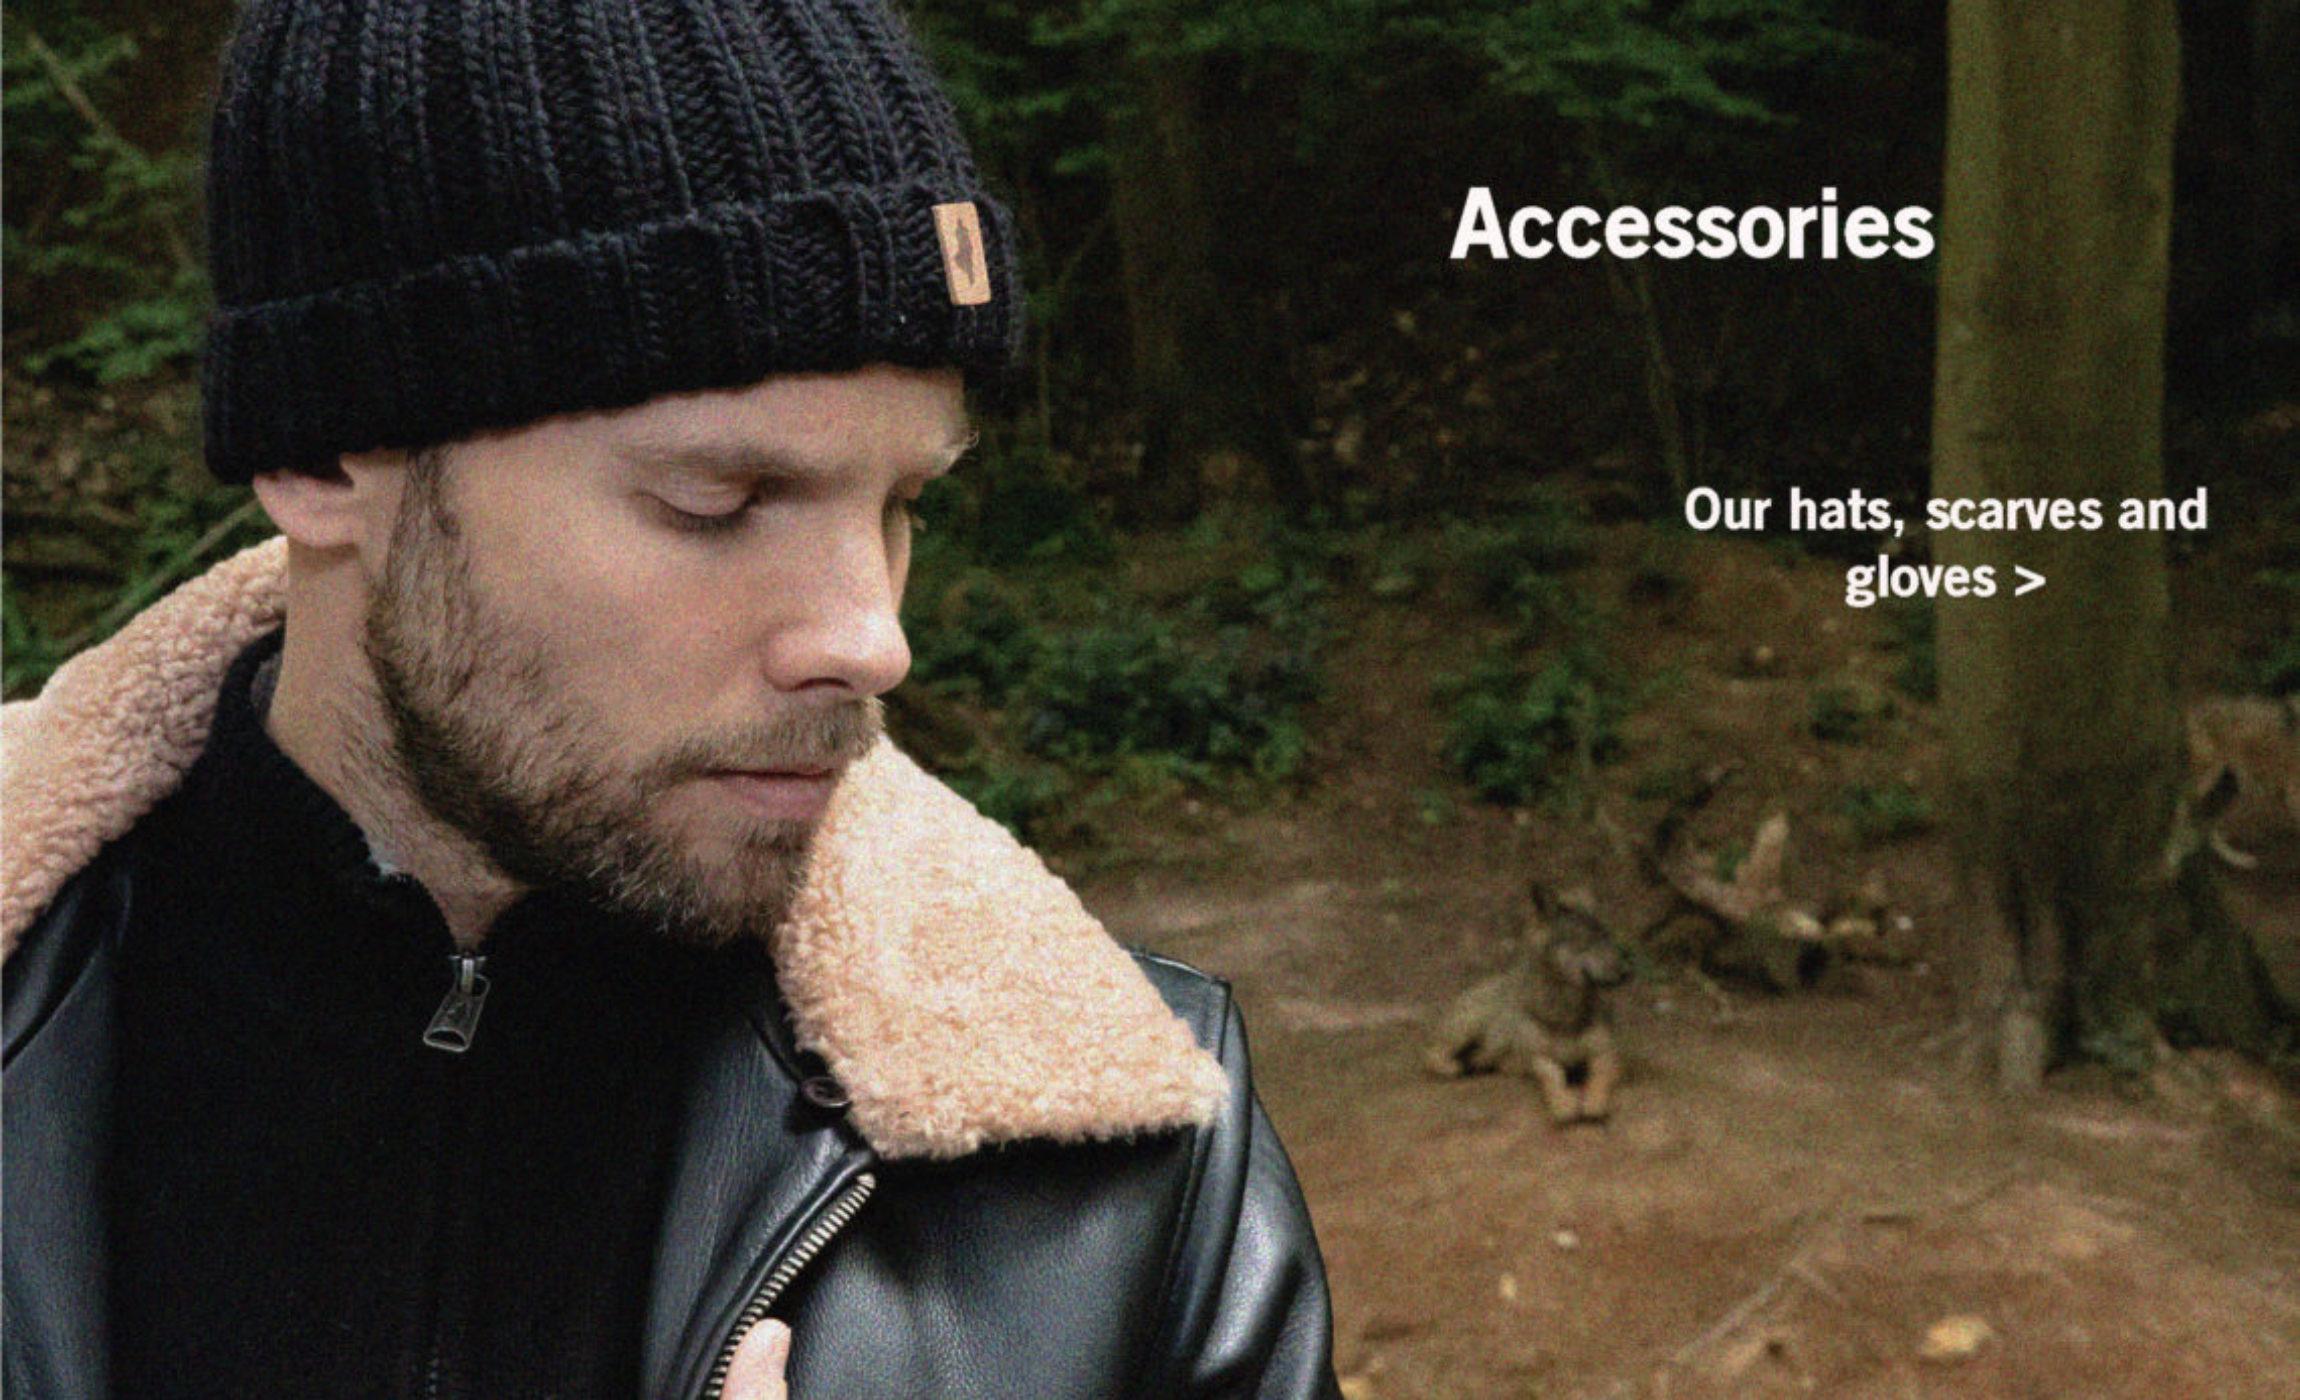 accessories homepage new EN soldes